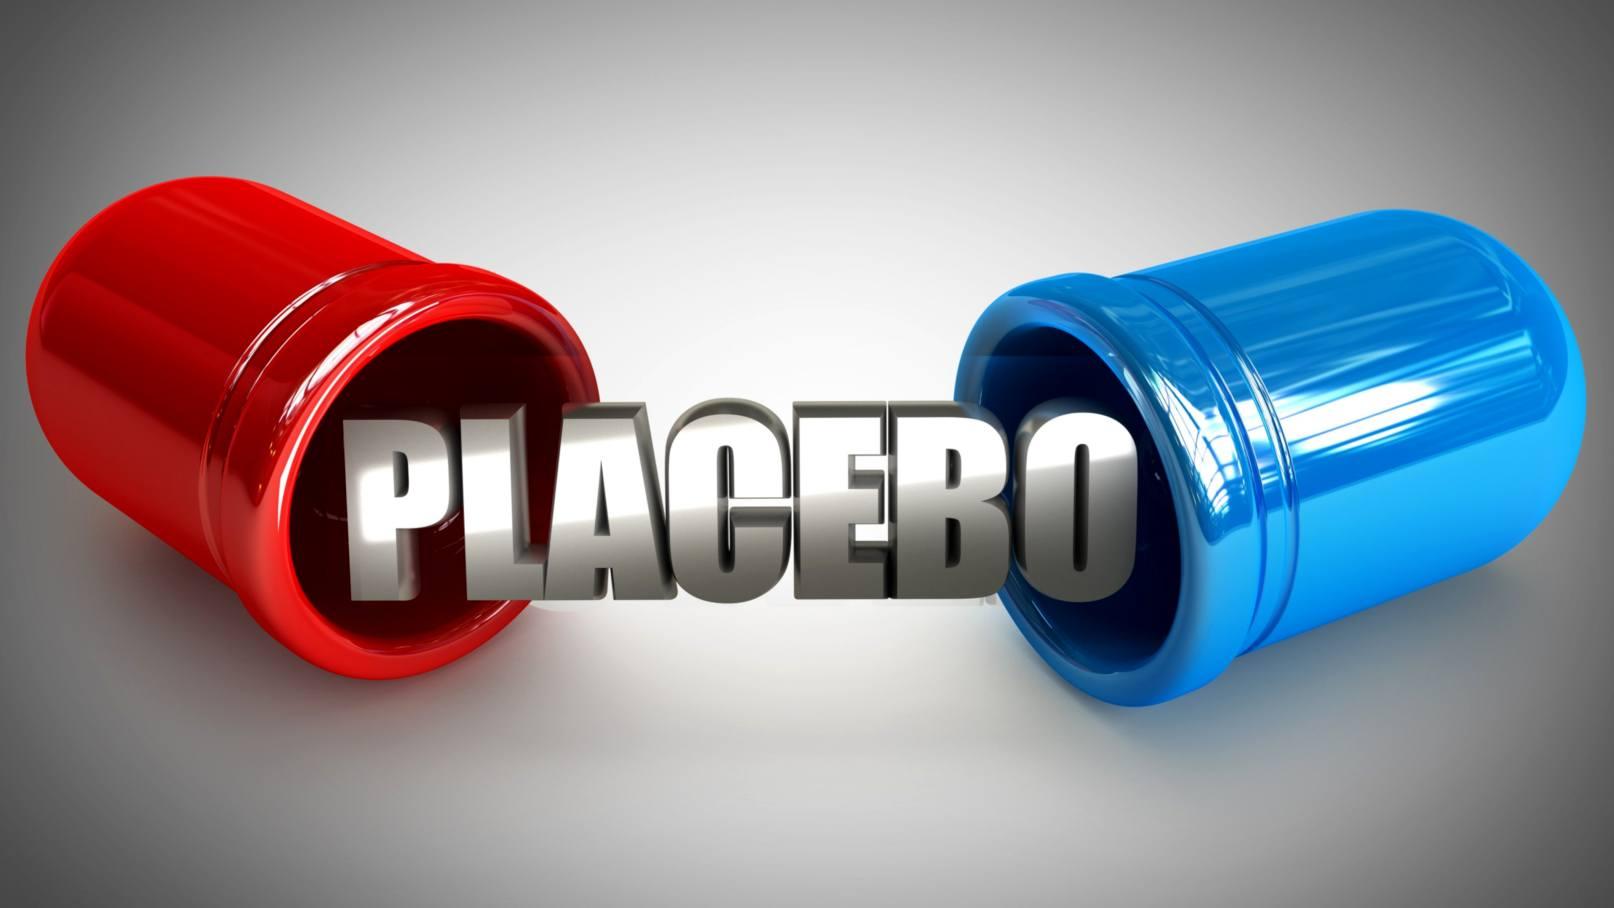 Плацебо — википедия переиздание // wiki 2